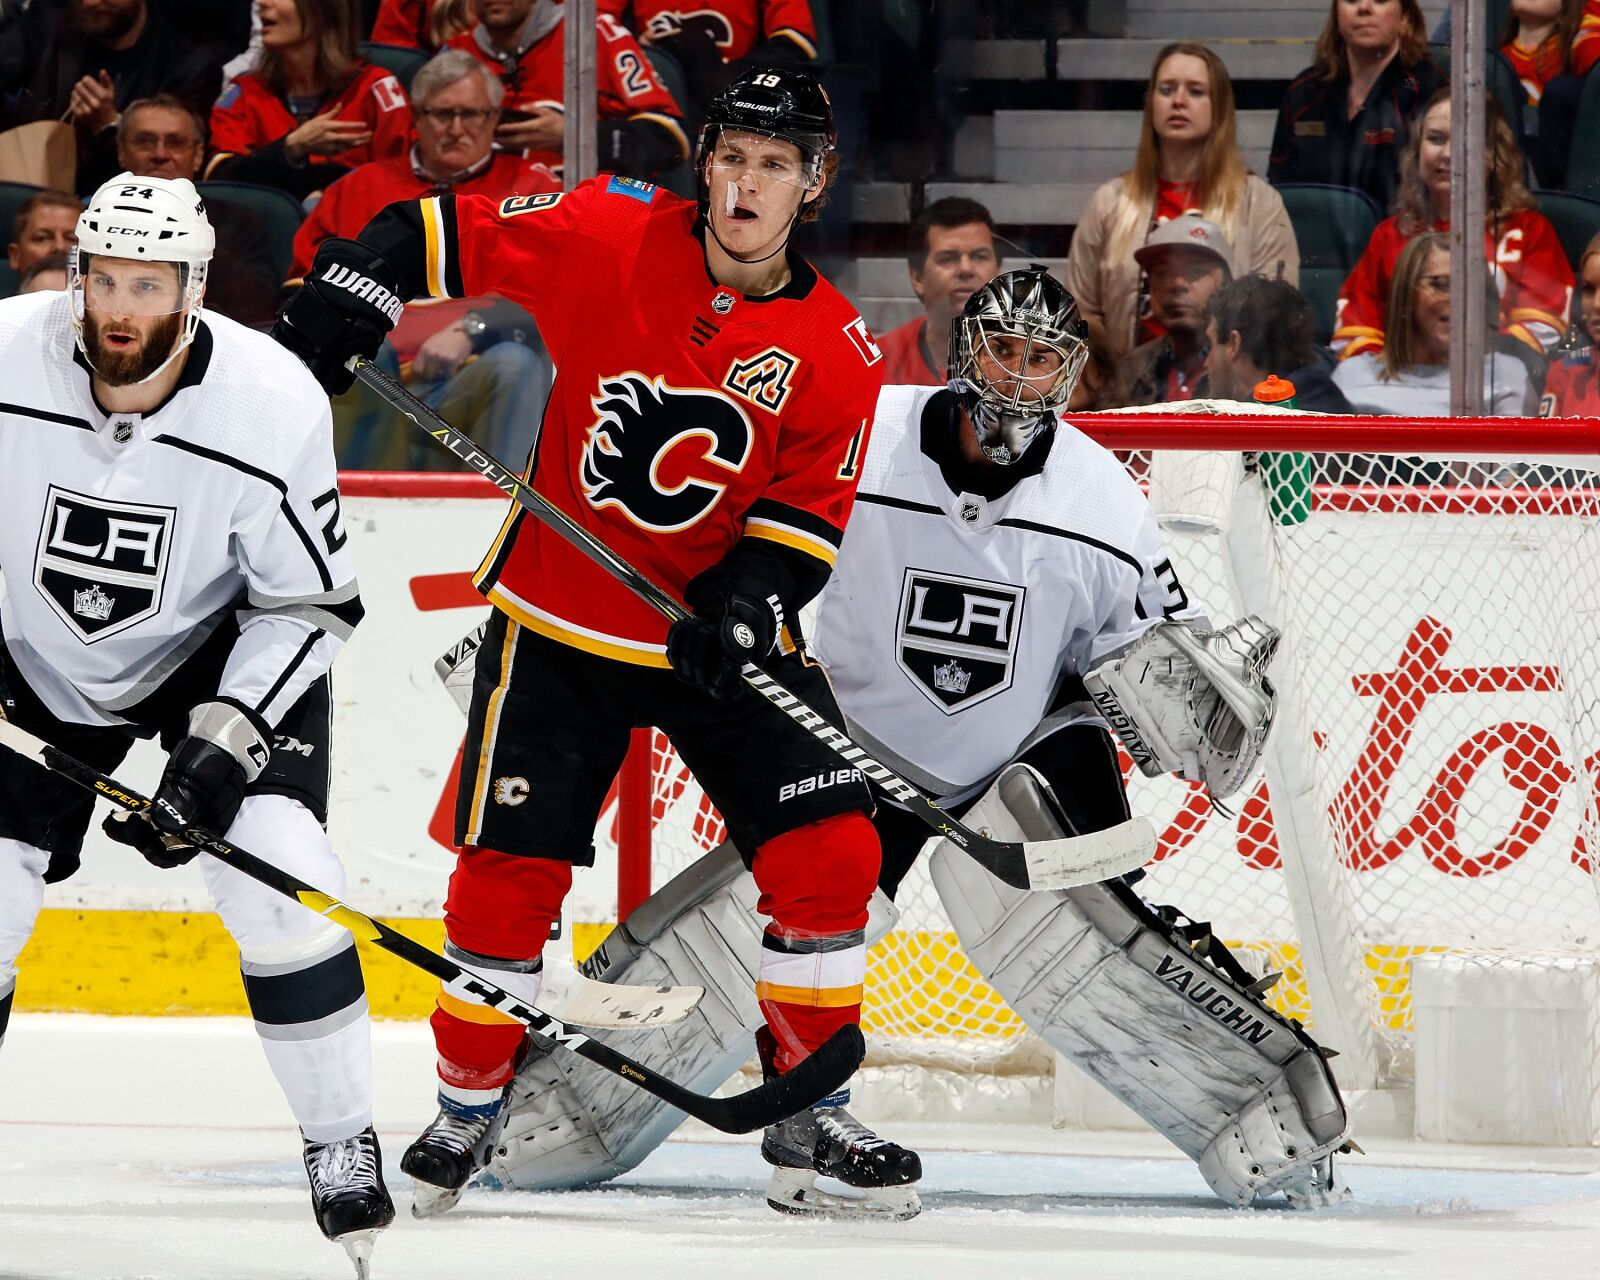 Calgary Flames: Matthew Tkachuk is the next great tipper